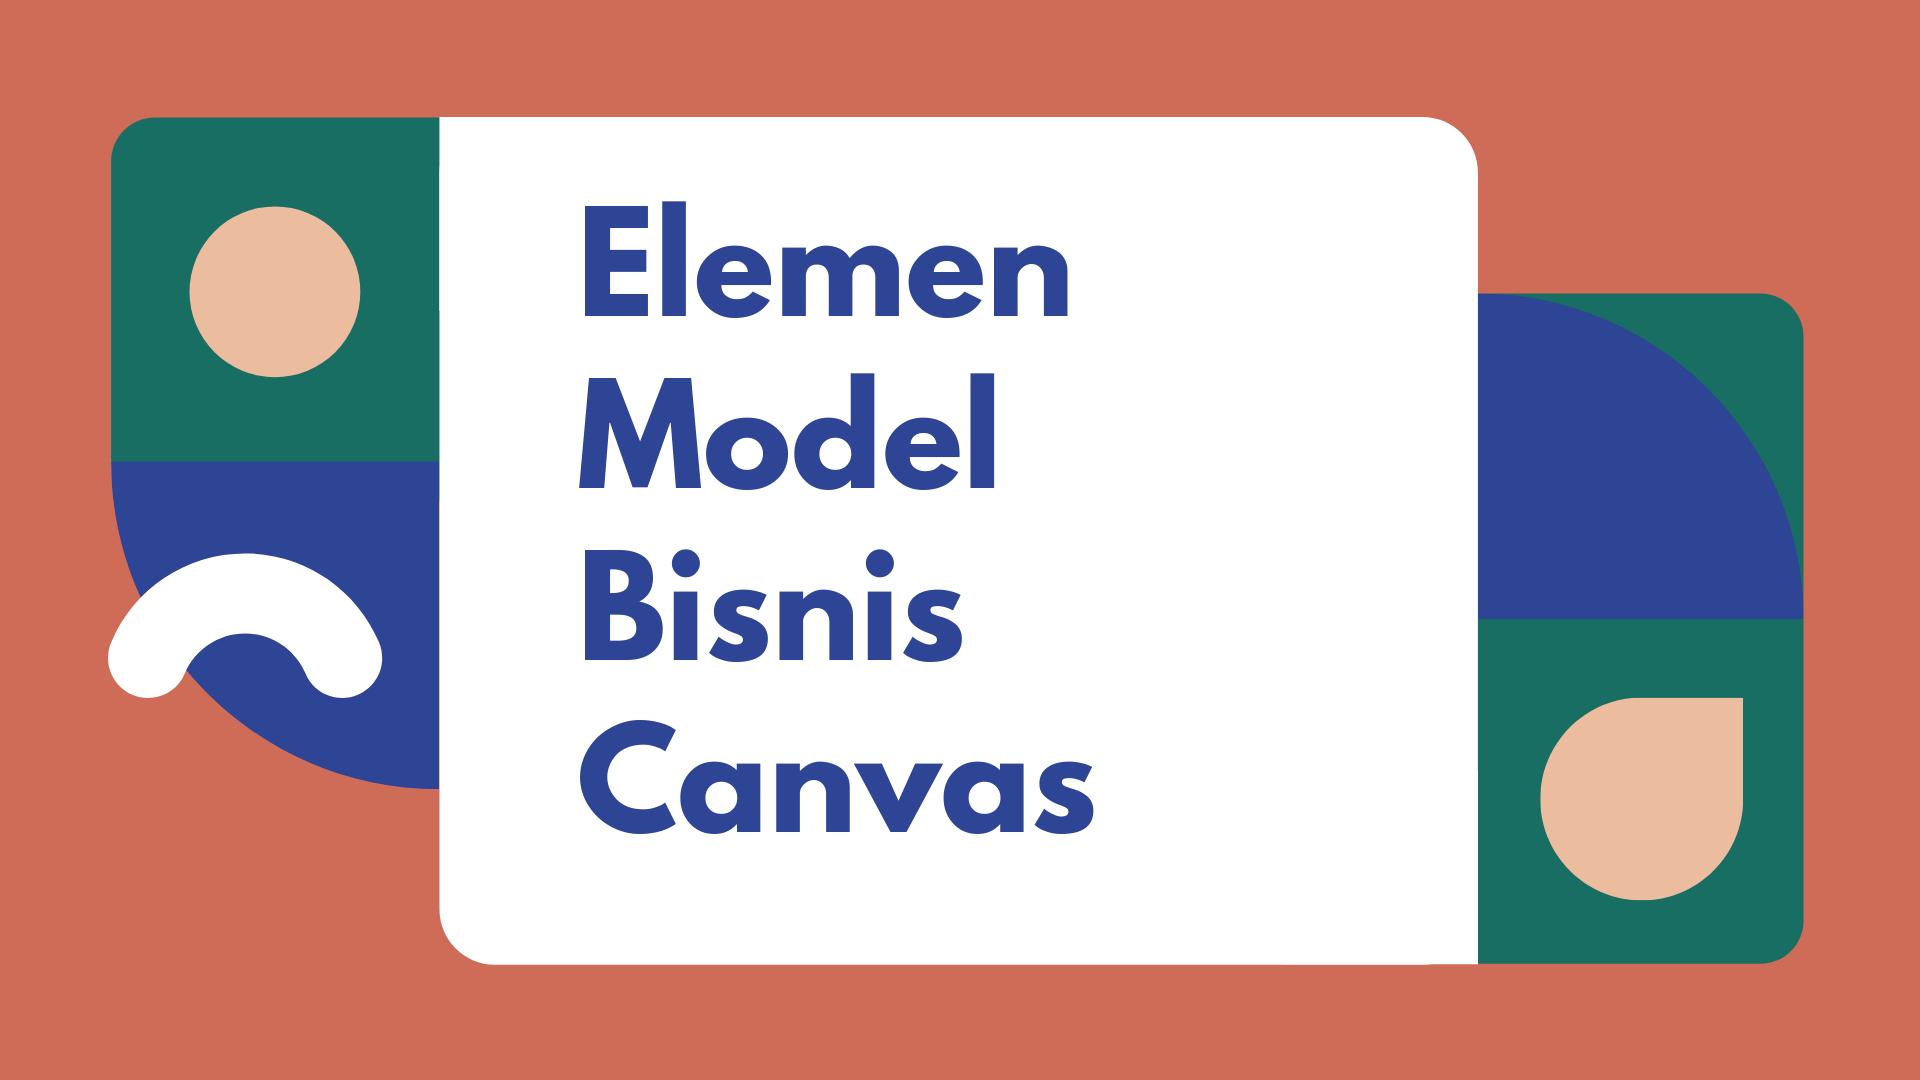 elemen model bisnis canvas